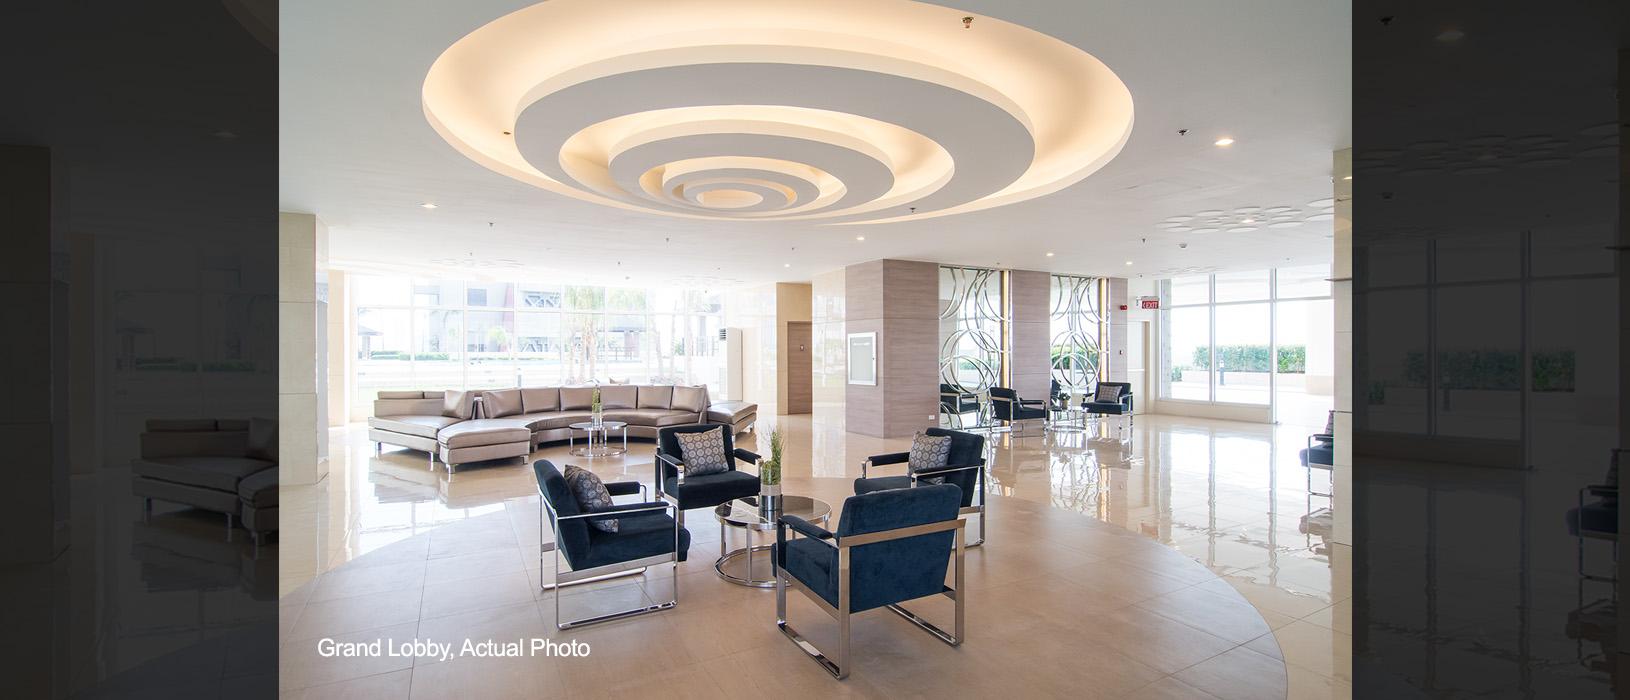 Sun Residences Grand Lobby